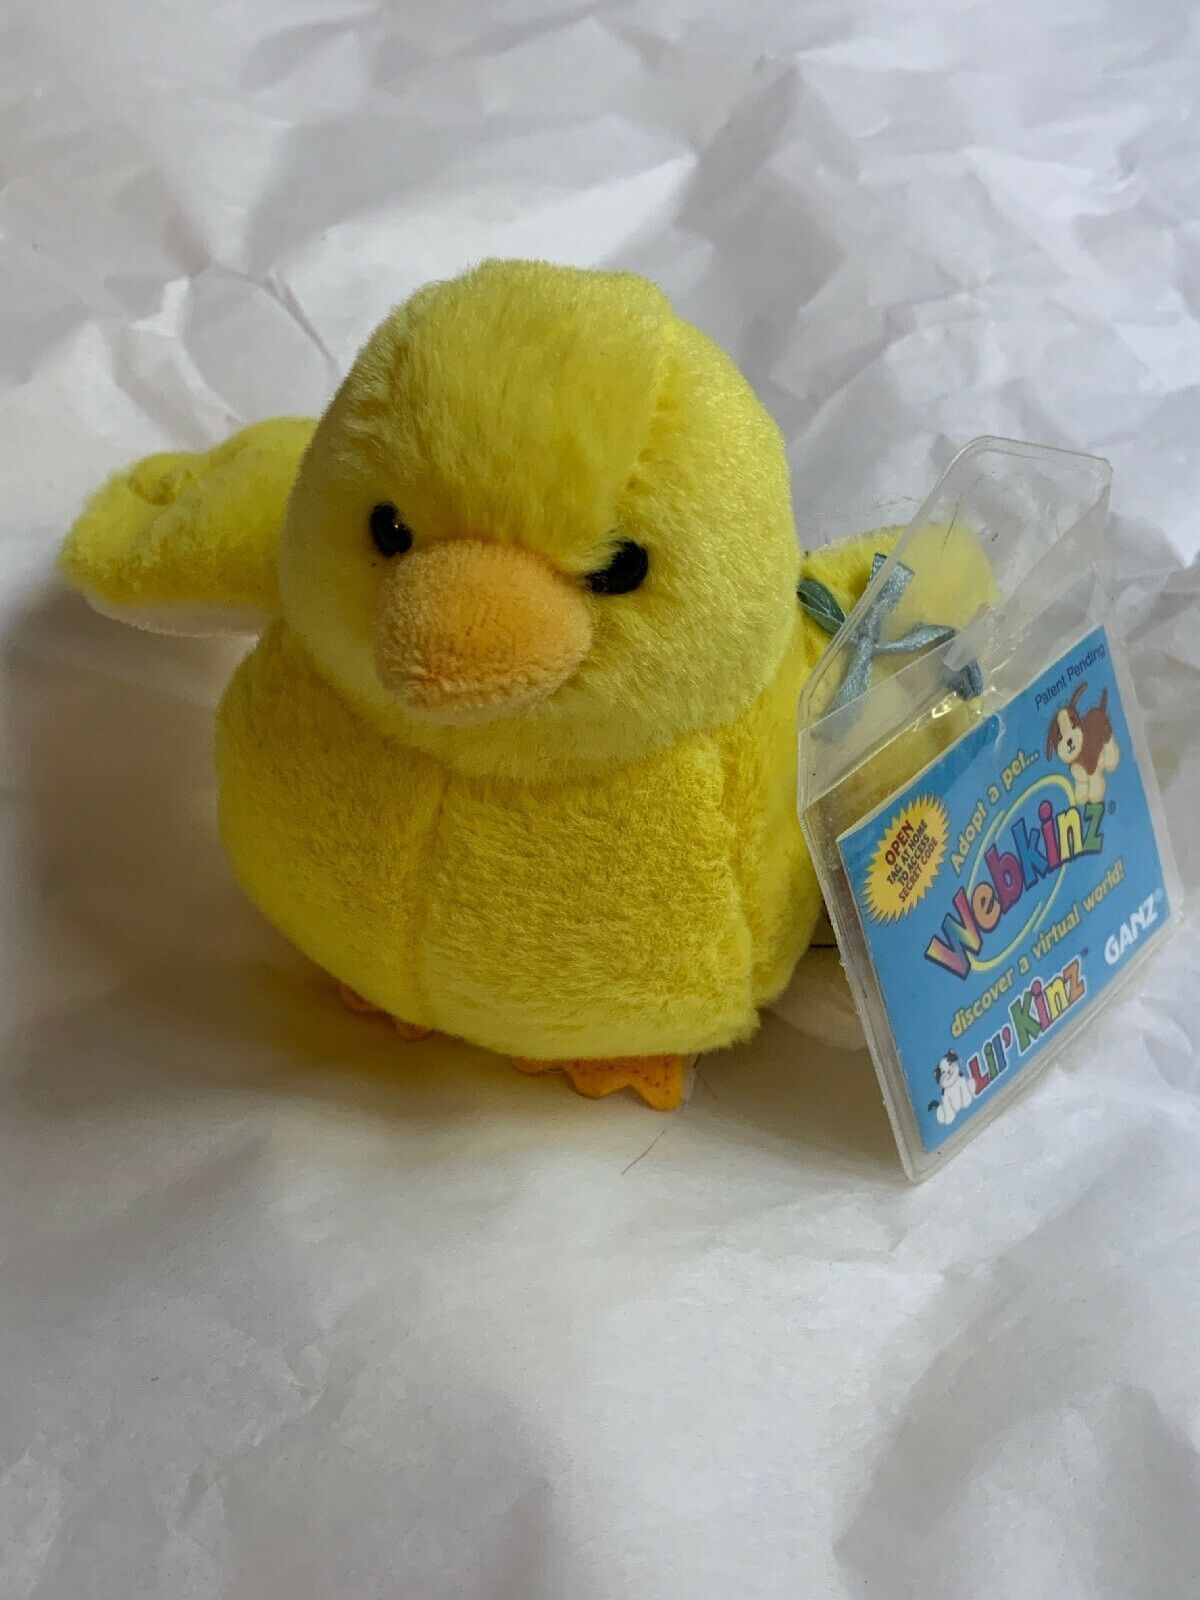 ganz webkinz lil kinz yellow canary bird plush w Code Card • Used Doll Toy Cute